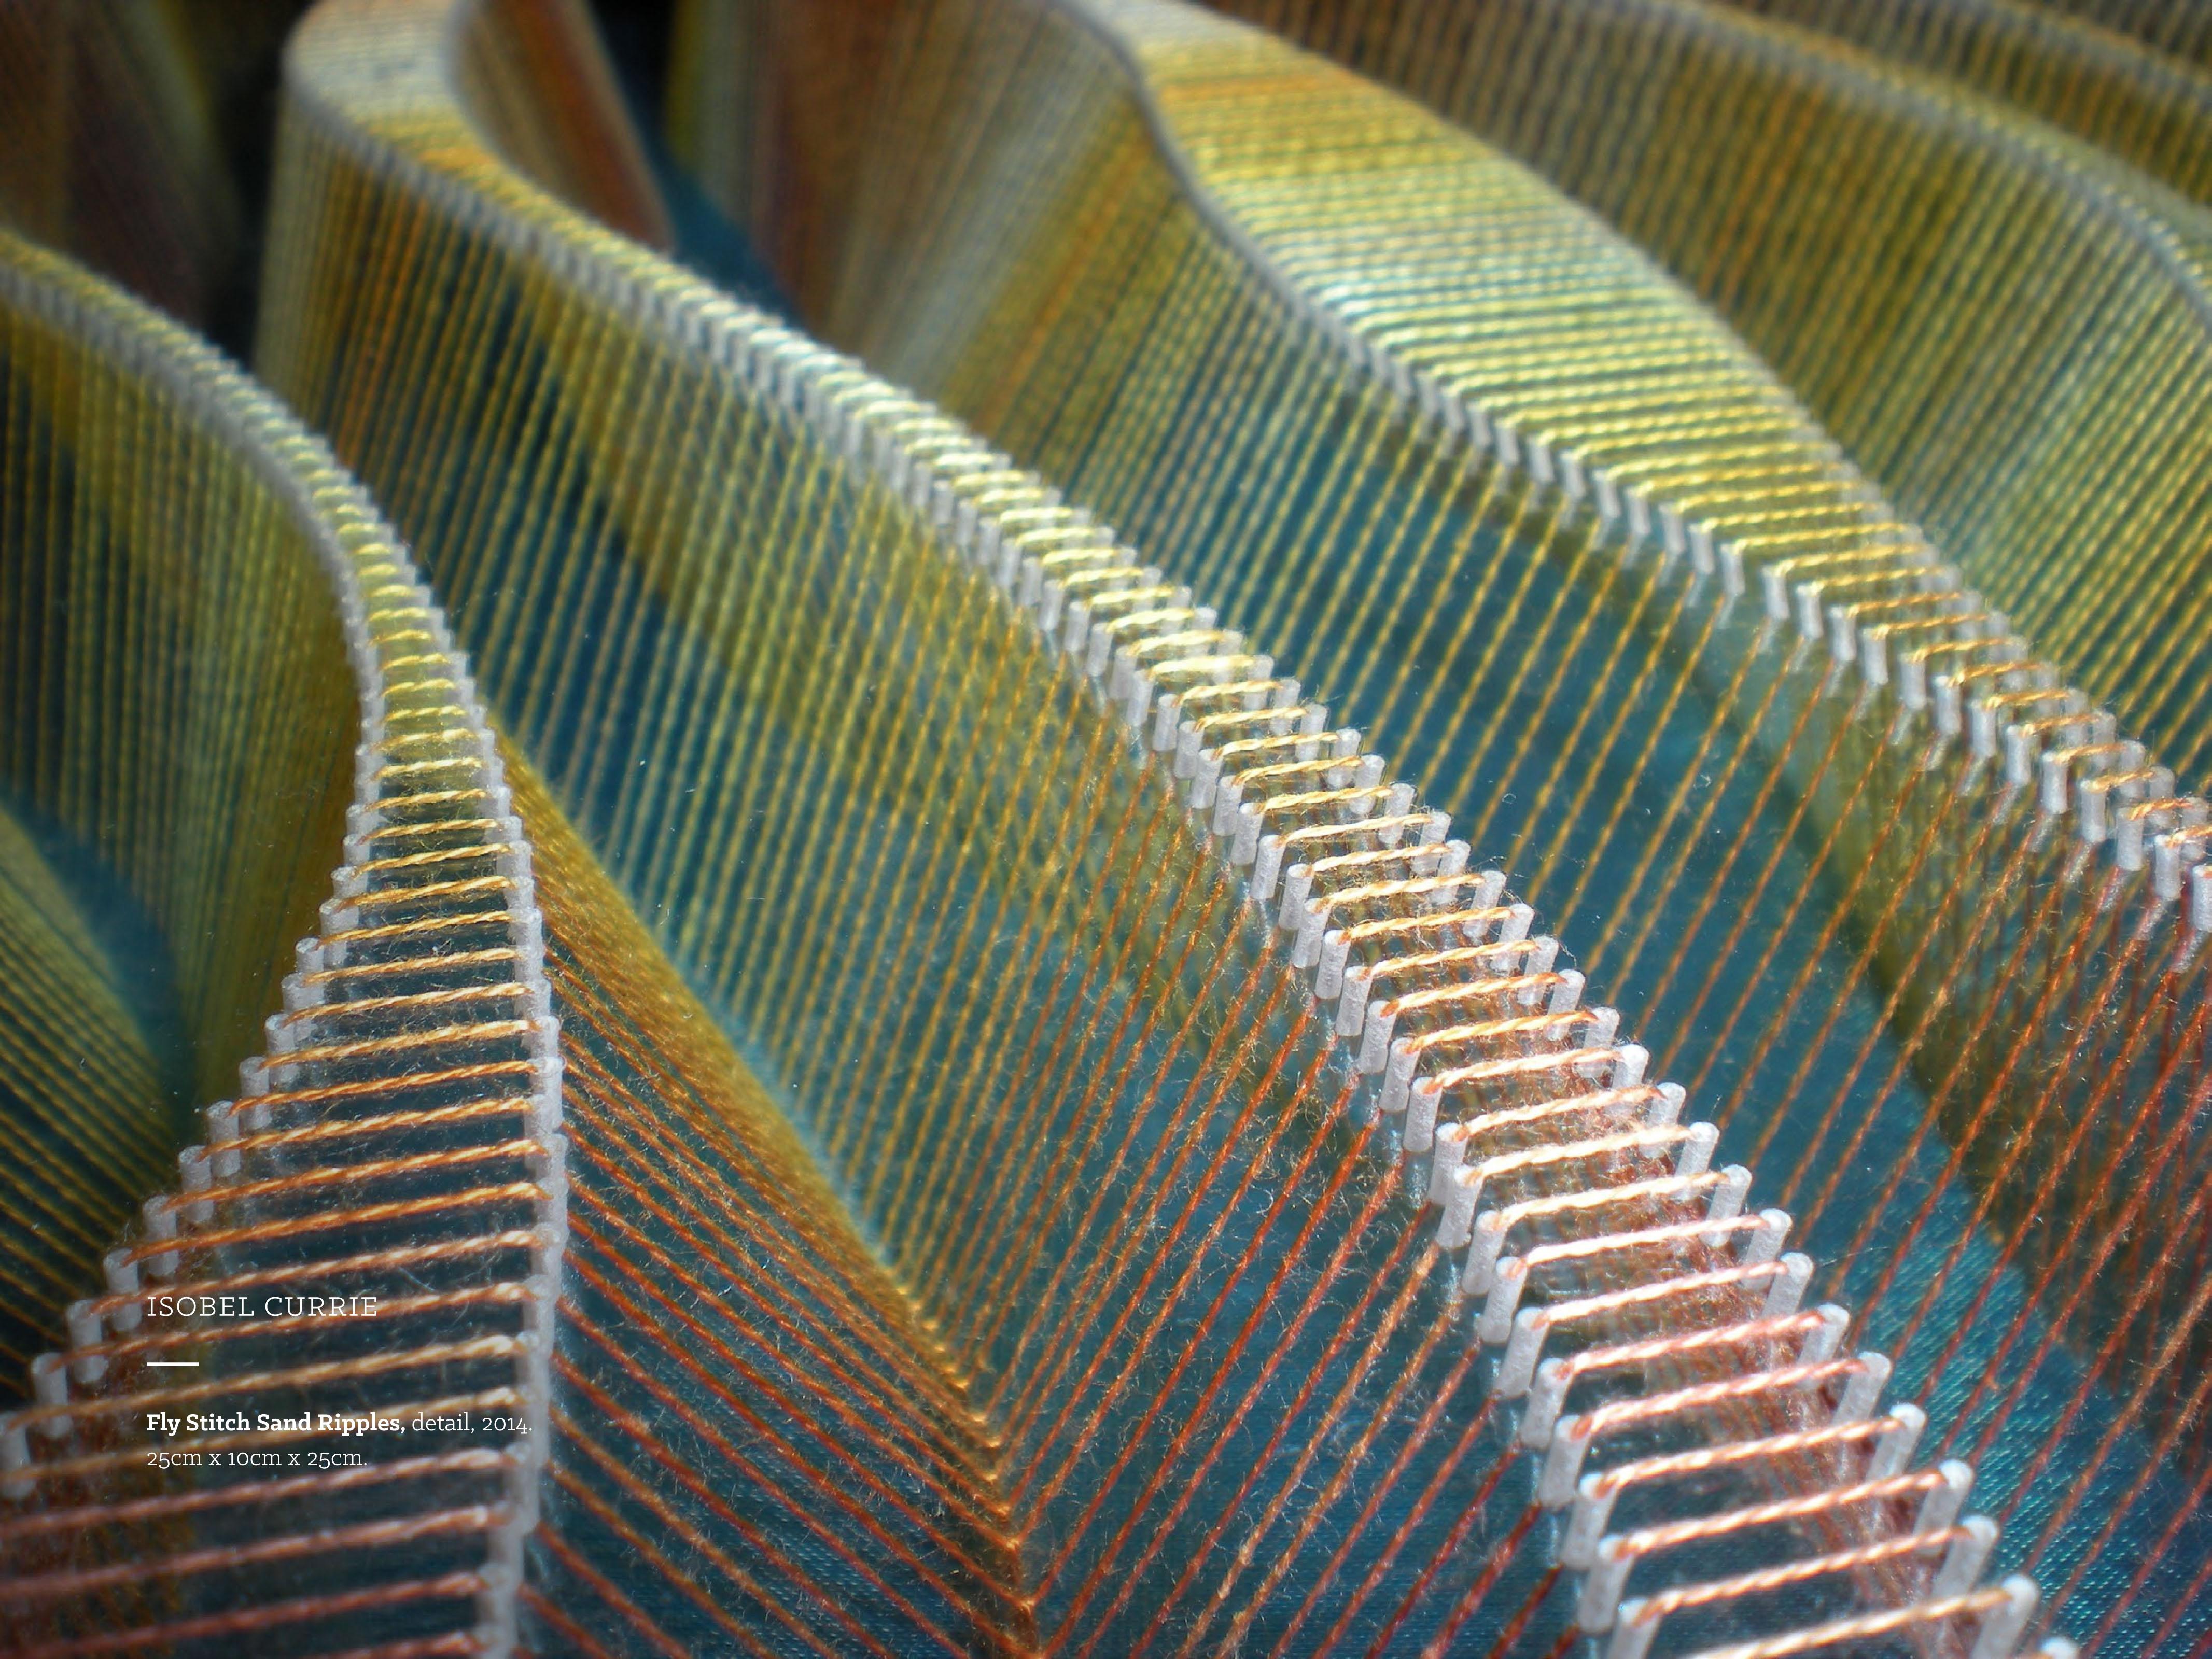 3D mixed media textile art - Isobel Currie